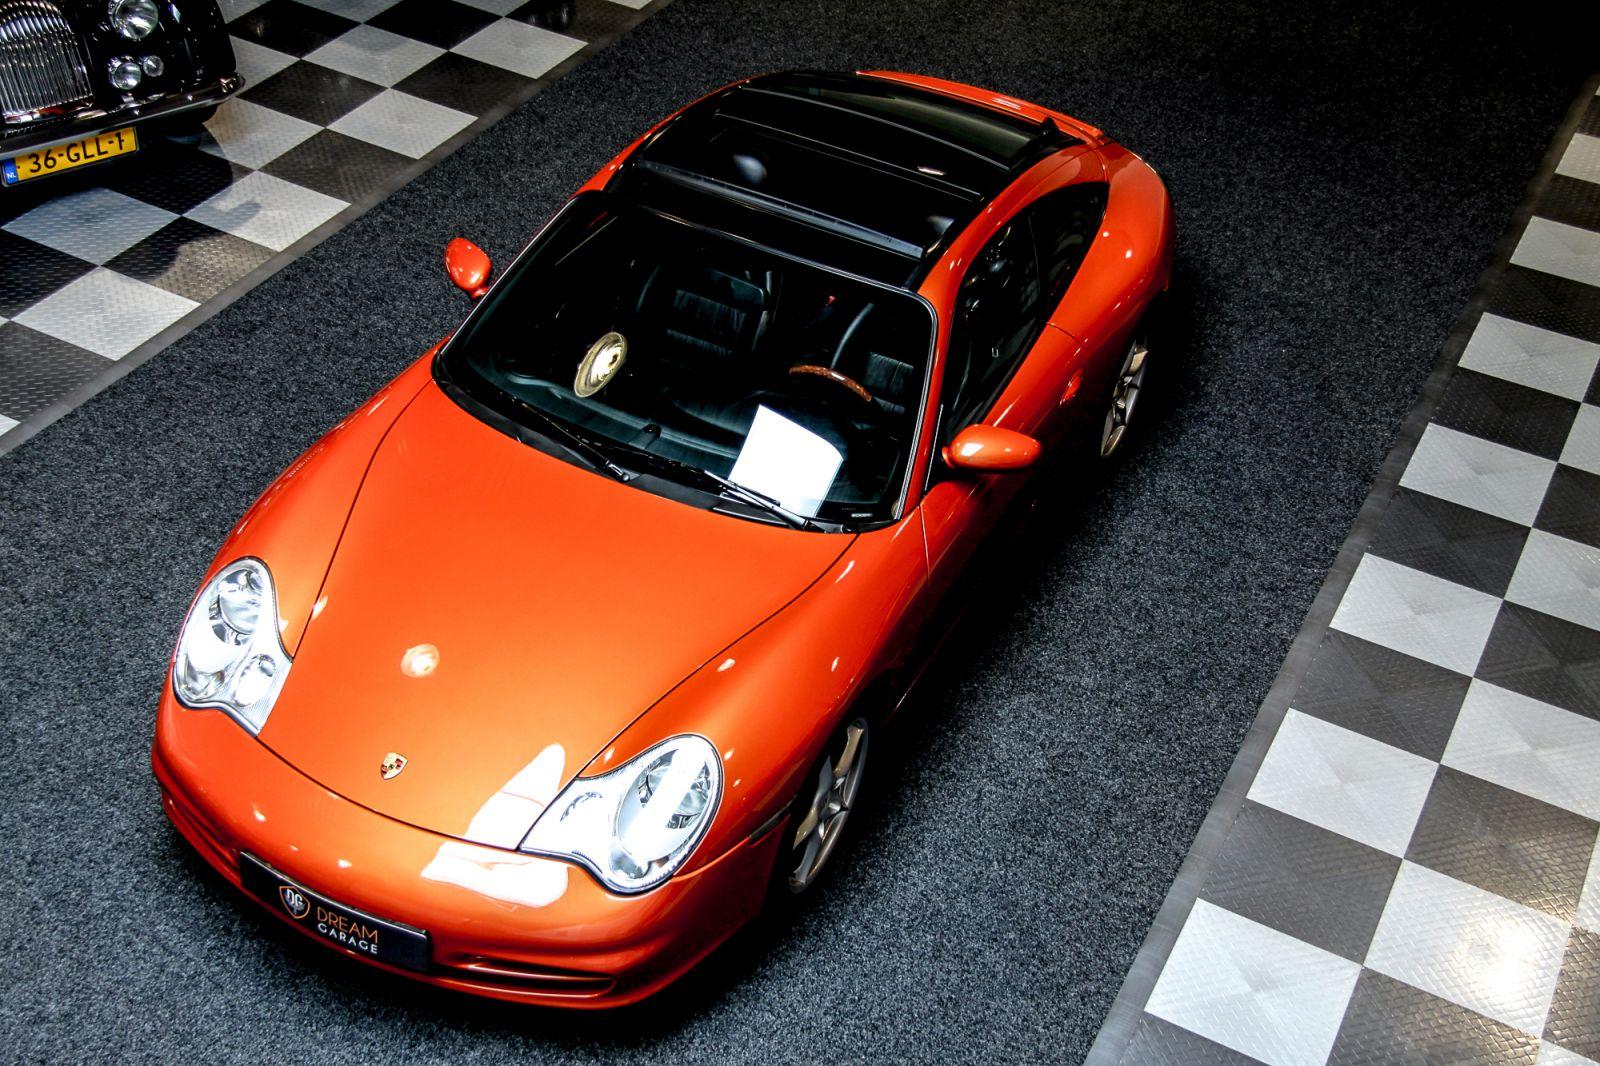 dream garage verkauftporsche porsche 911 996 carrera 2 targa tiptronic. Black Bedroom Furniture Sets. Home Design Ideas